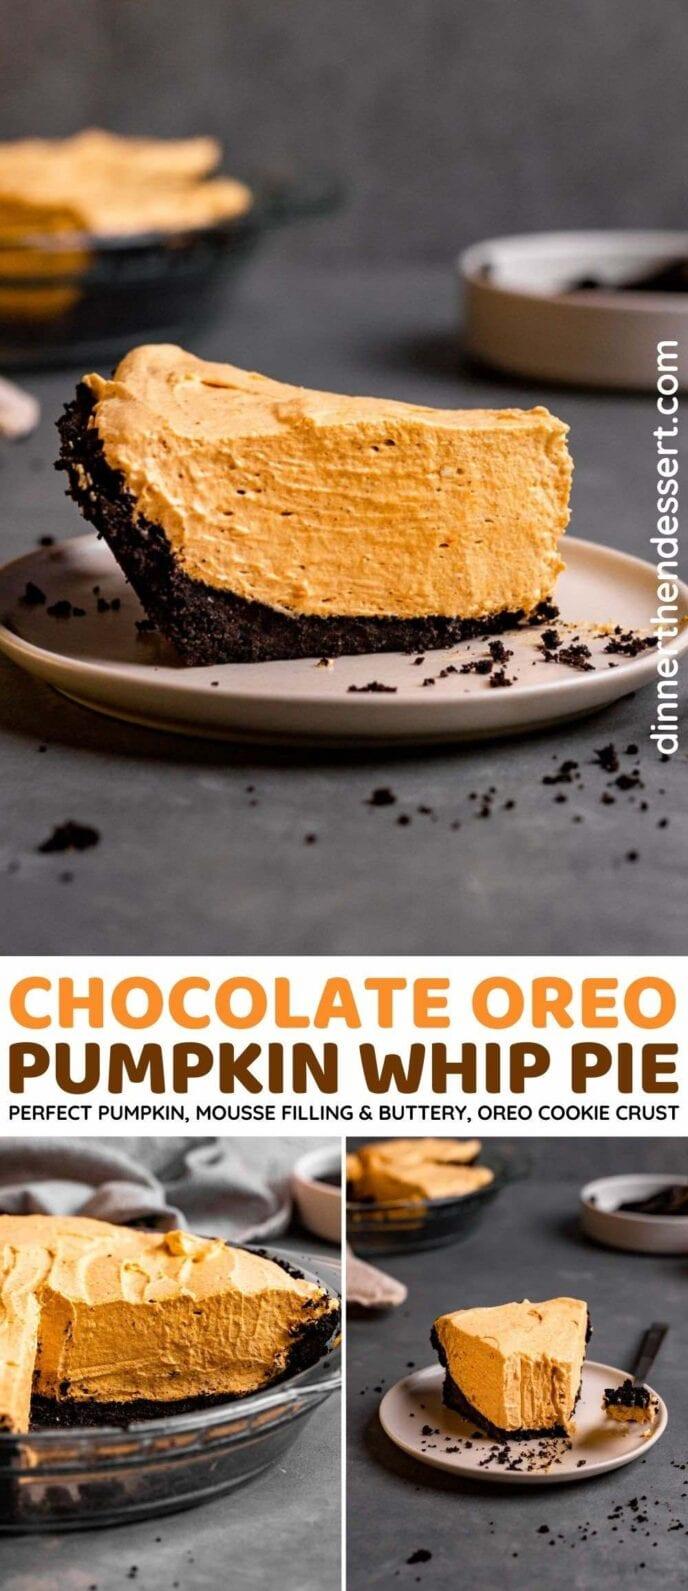 Chocolate Oreo Pumpkin Whip Pie